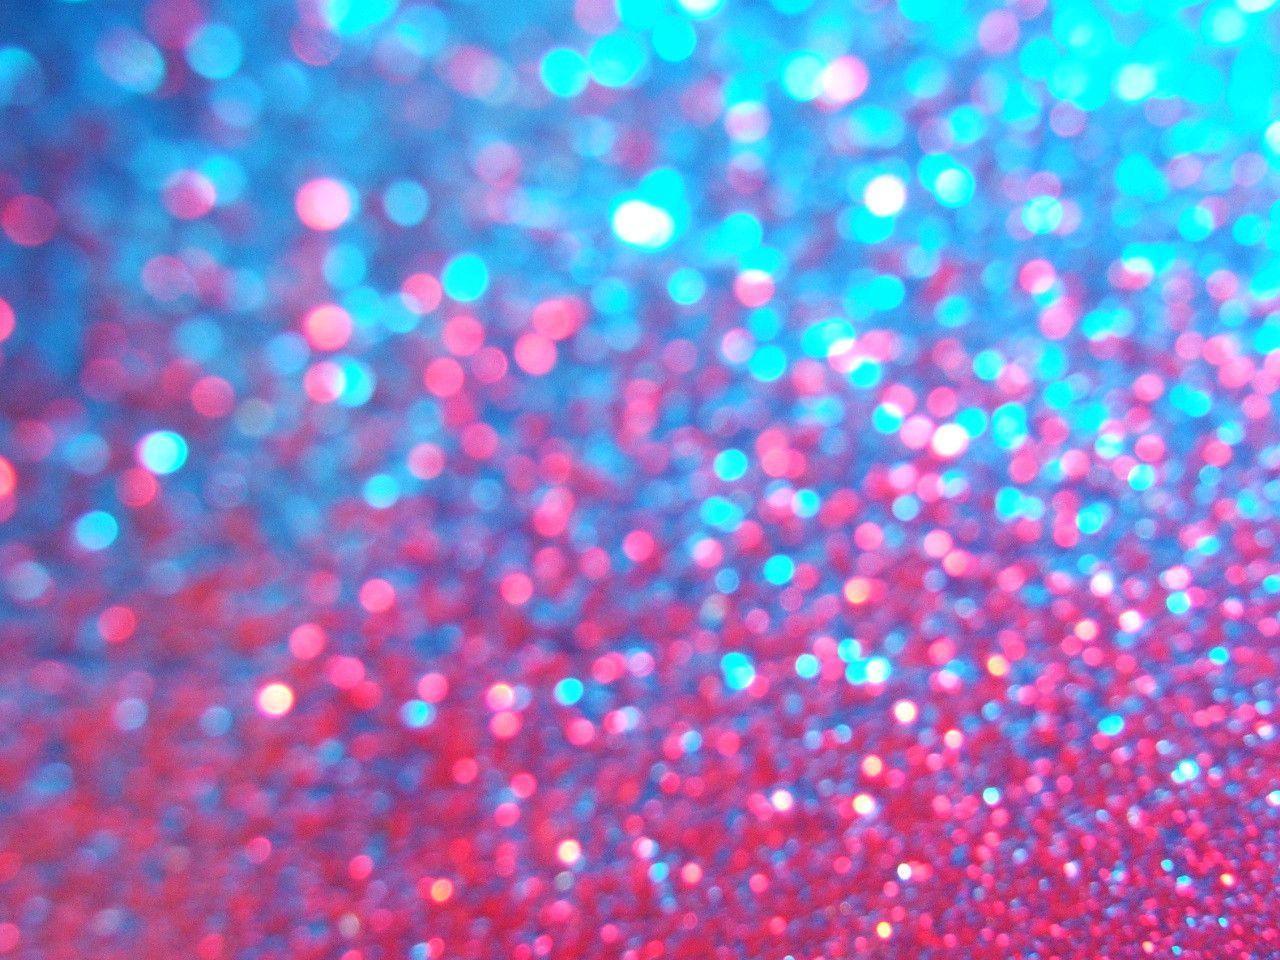 tumblr backgrounds glitter - photo #10